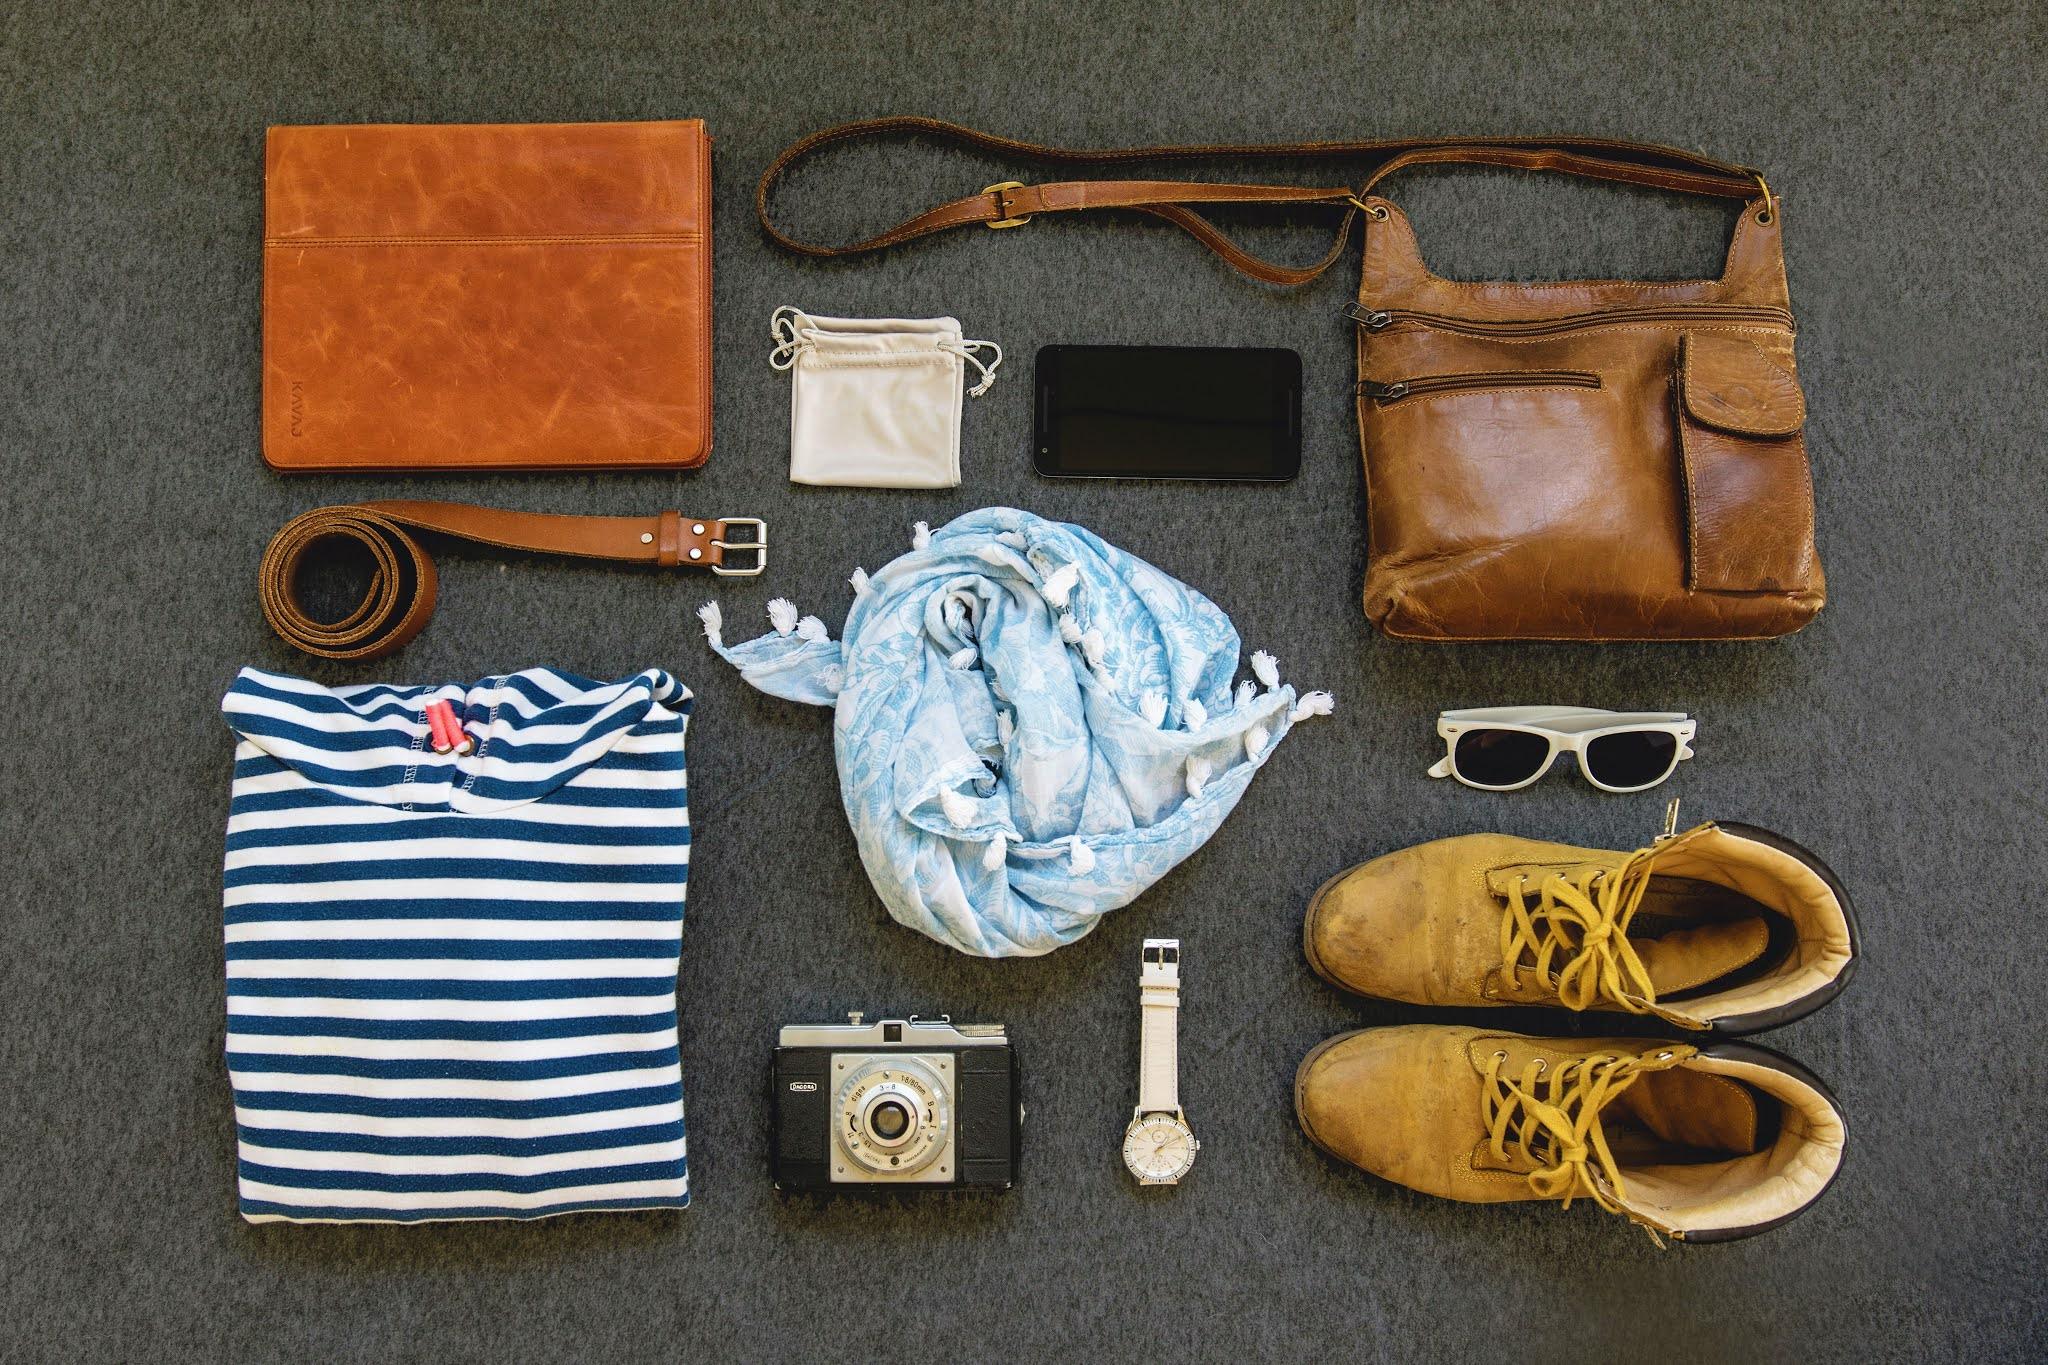 ROAD TRIP ESSENTIALS: CLOTHING